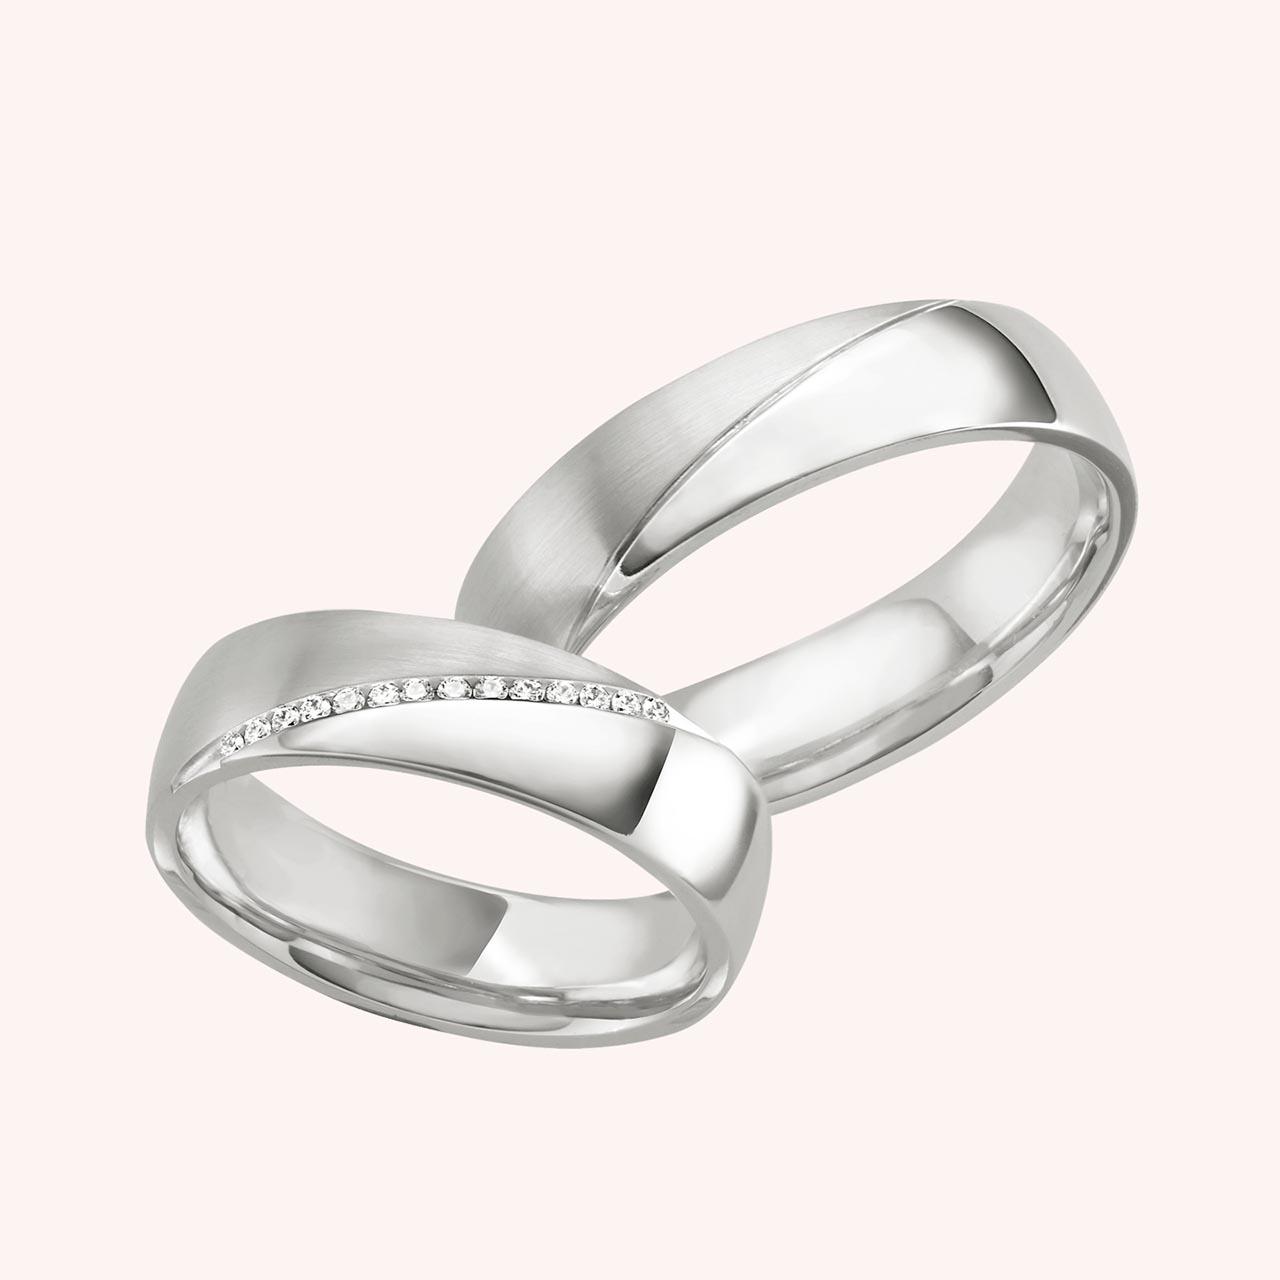 Trauringe aus Silber  Diamanten 007ct  EHERINGEde